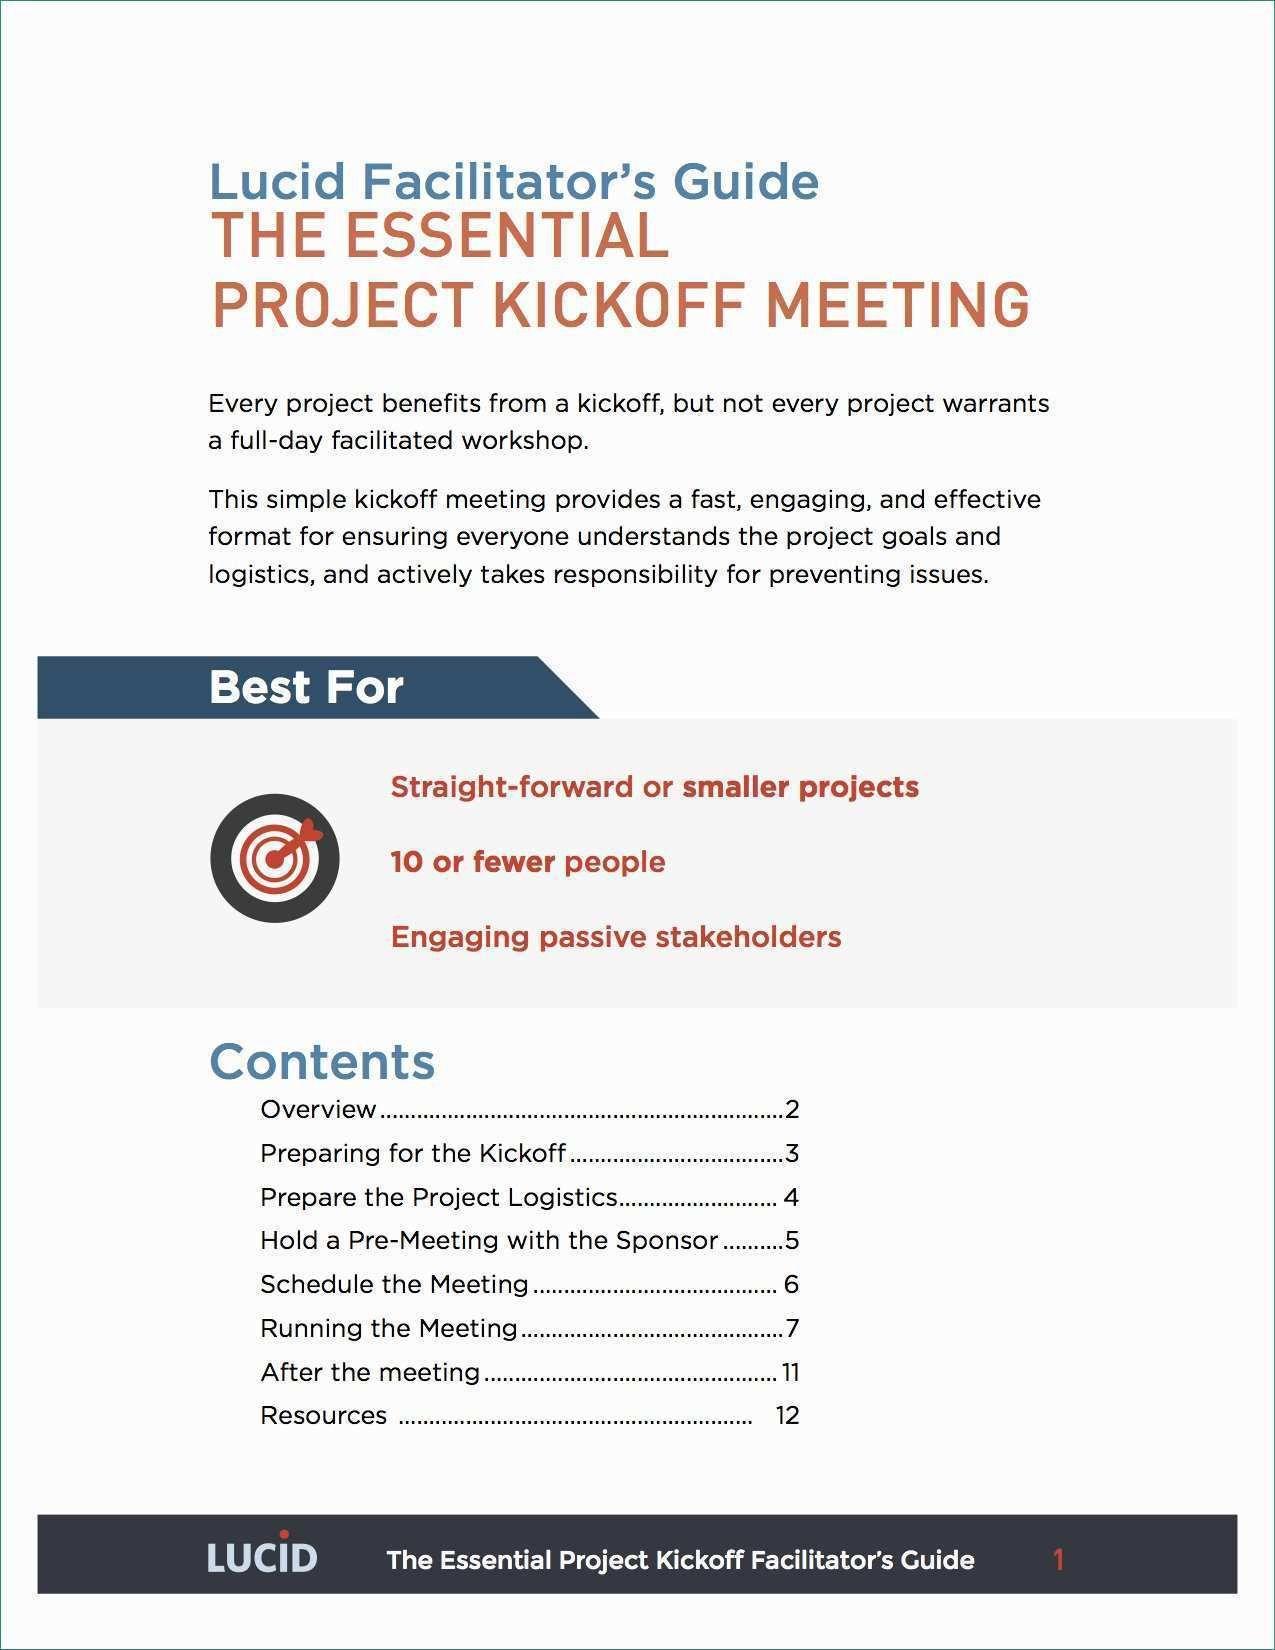 001 Surprising Project Kickoff Meeting Agenda Template Sample  ManagementFull